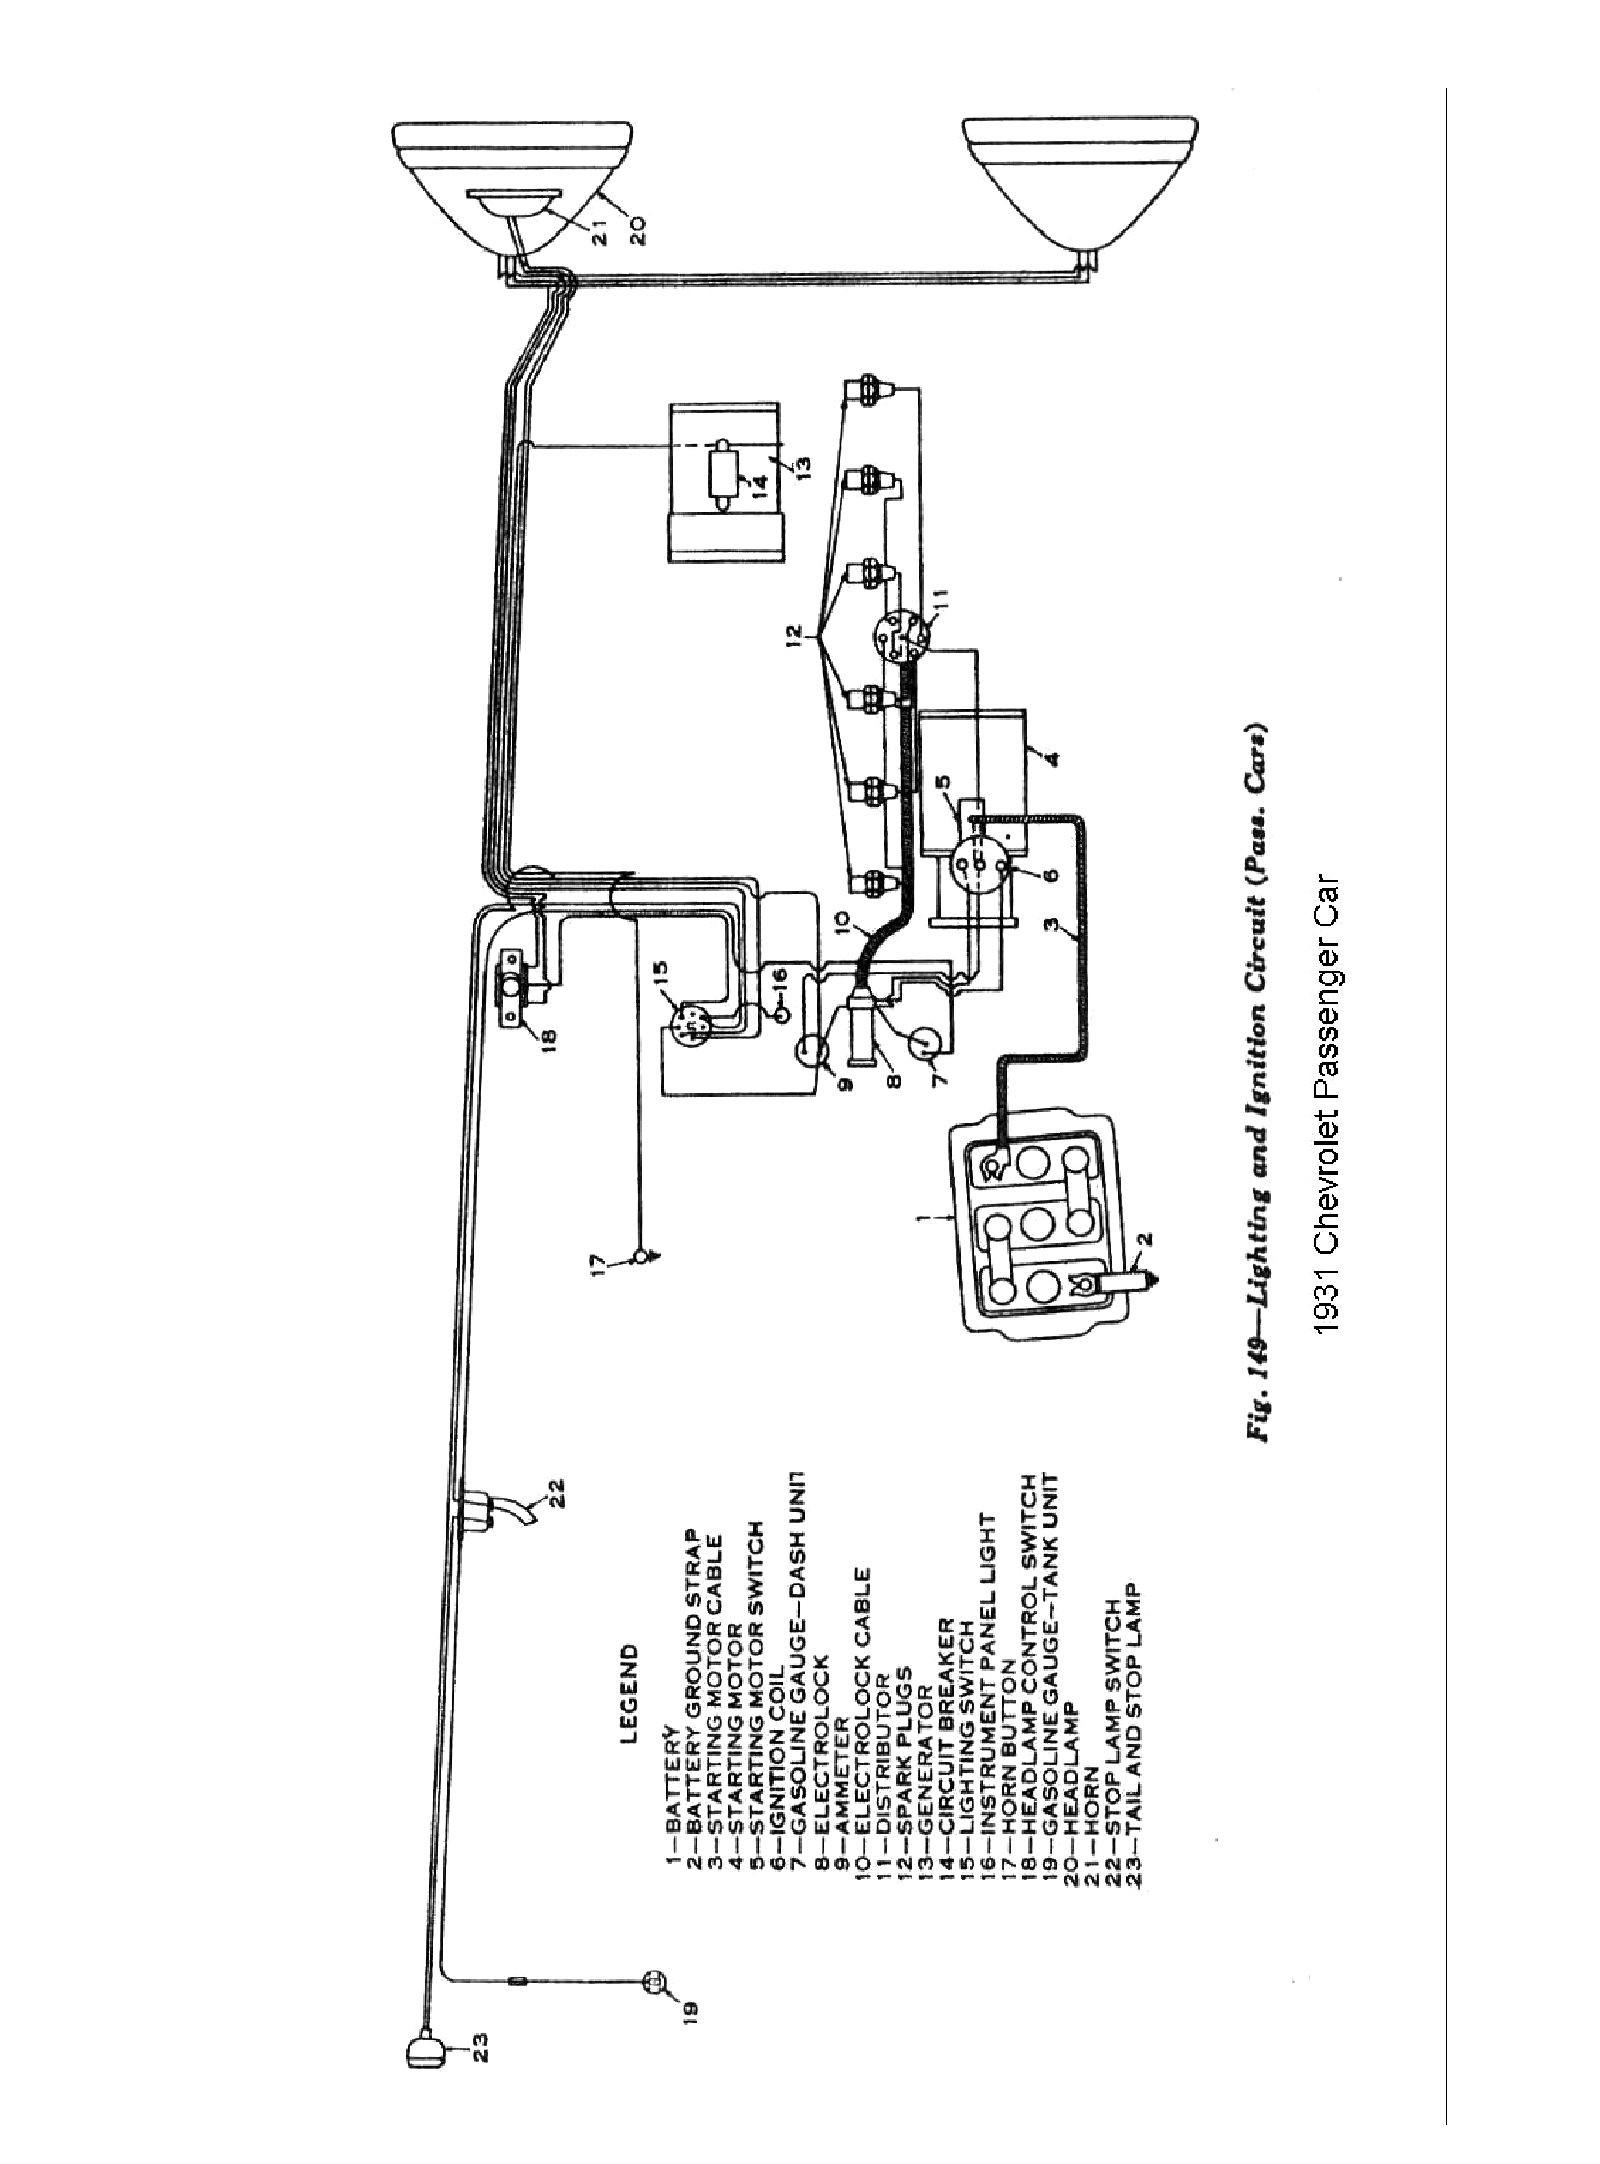 Jeep Cj7 Fuel Gauge Wiring Diagram Schematic Guide And Cj Brakelights 73 Blazer Diagrams Img Rh 46 Andreas Bolz De 7 Brake Light 1979